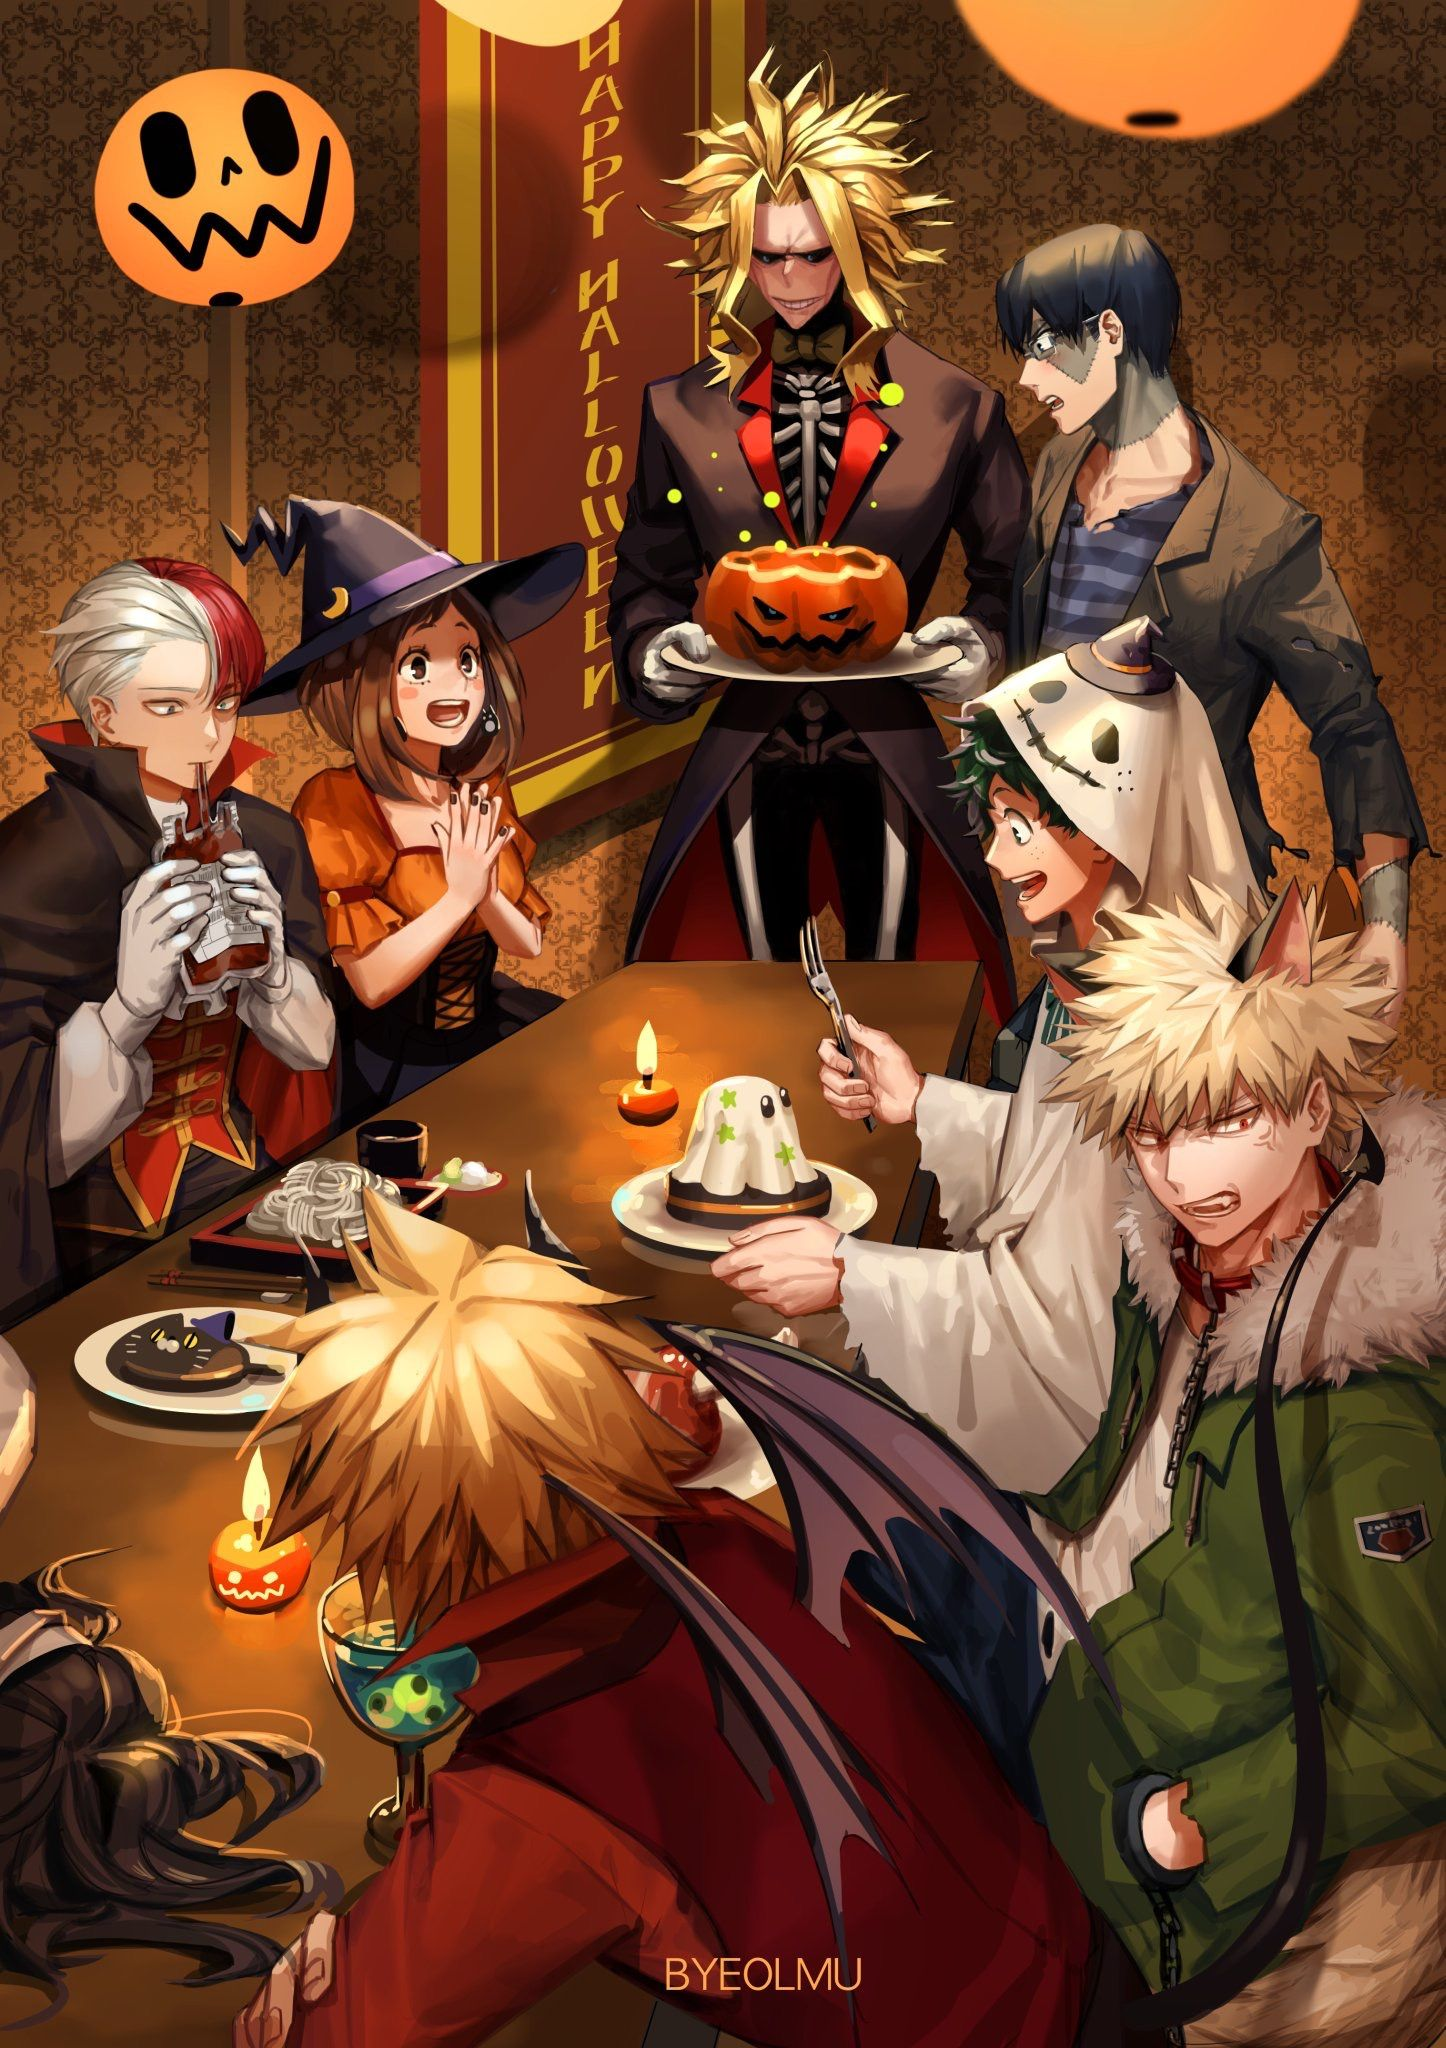 Pin By Mekanju On Bnha My Hero Anime Halloween Hero Academia Characters